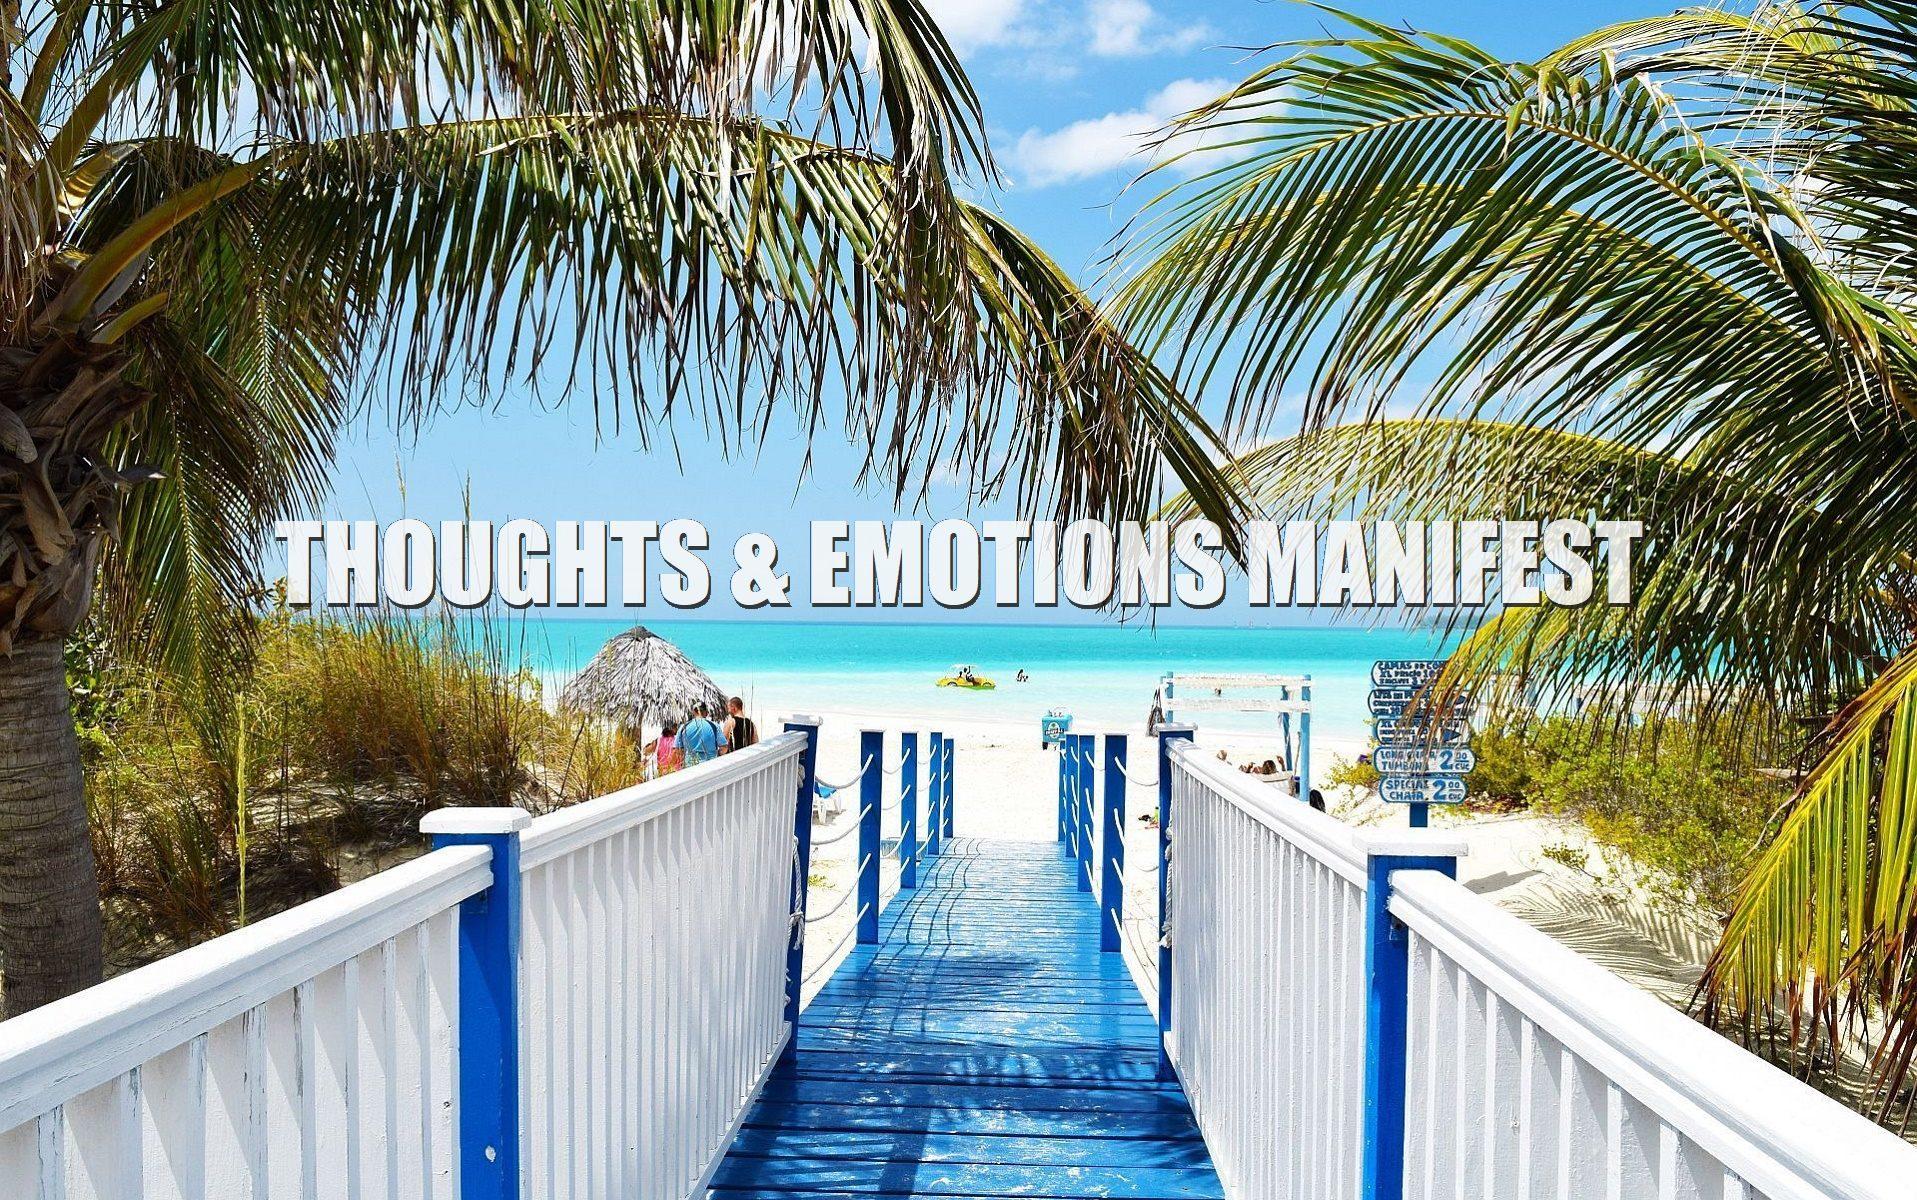 Thoughts-emotions-manifest-metaphysics-illustration-33-1917